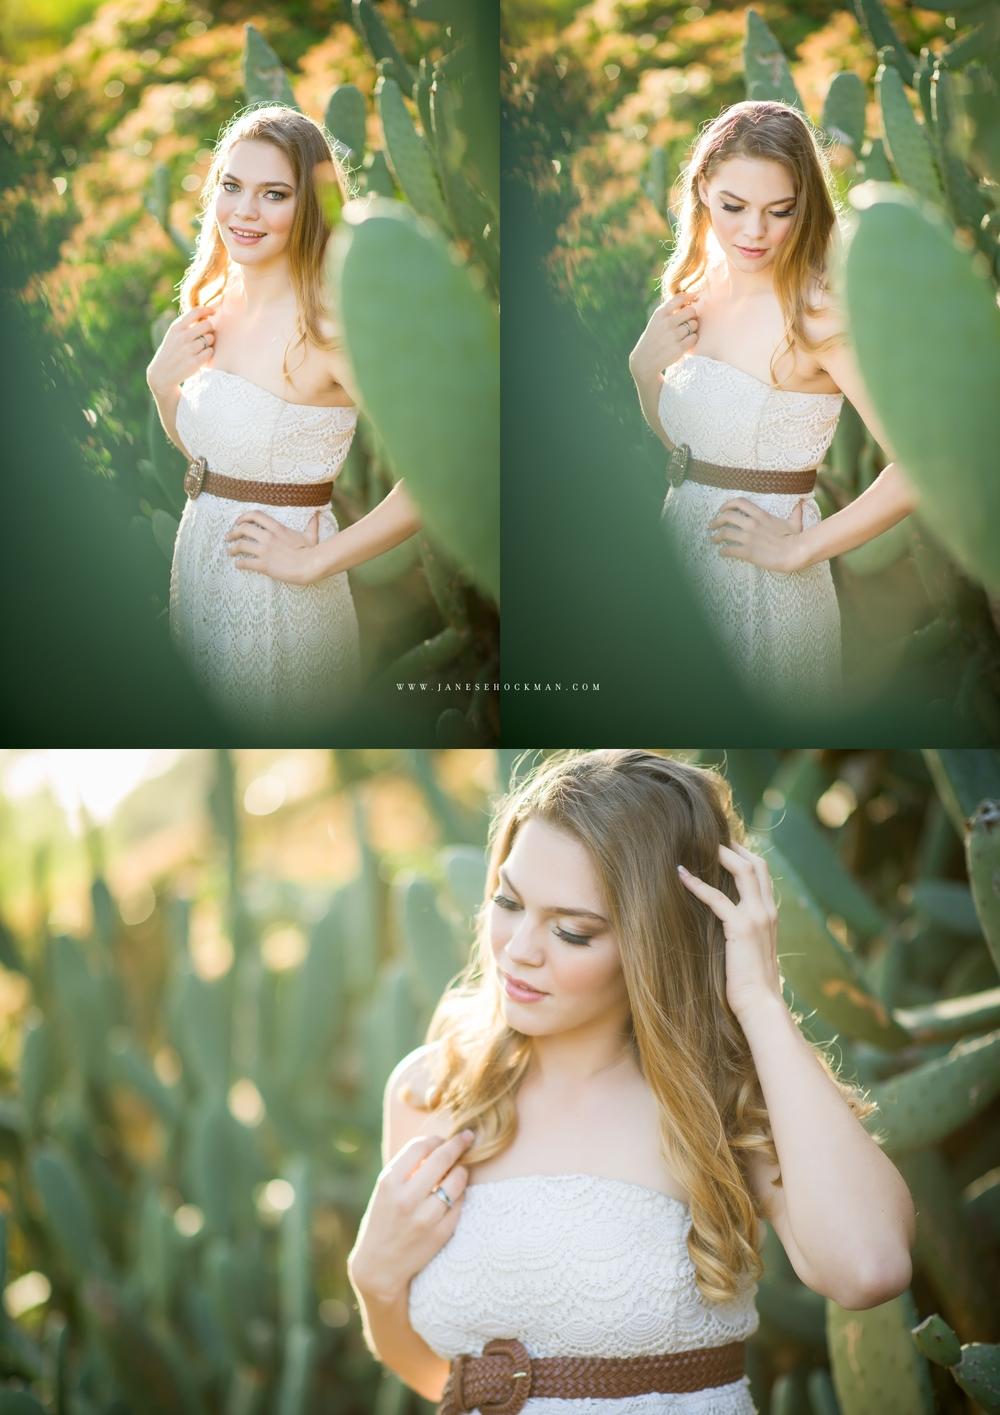 Holly | Janese Hockman Photography | San Luis Obispo, California | High School Senior Portraits | Huntington Beach 7.jpg